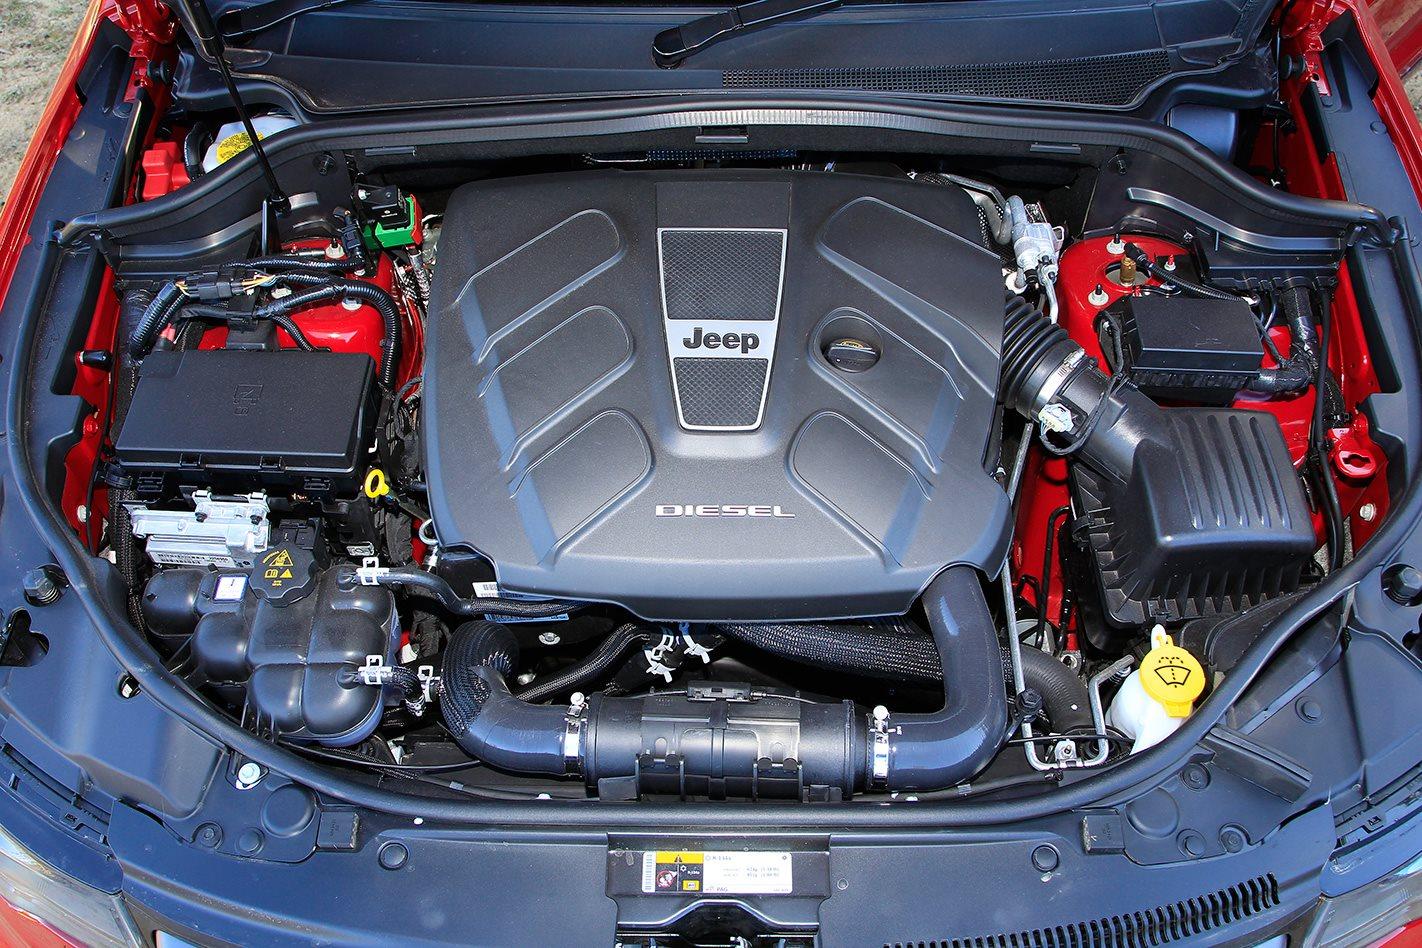 2017 Jeep Grand Cherokee Trailhawk engine.jpg